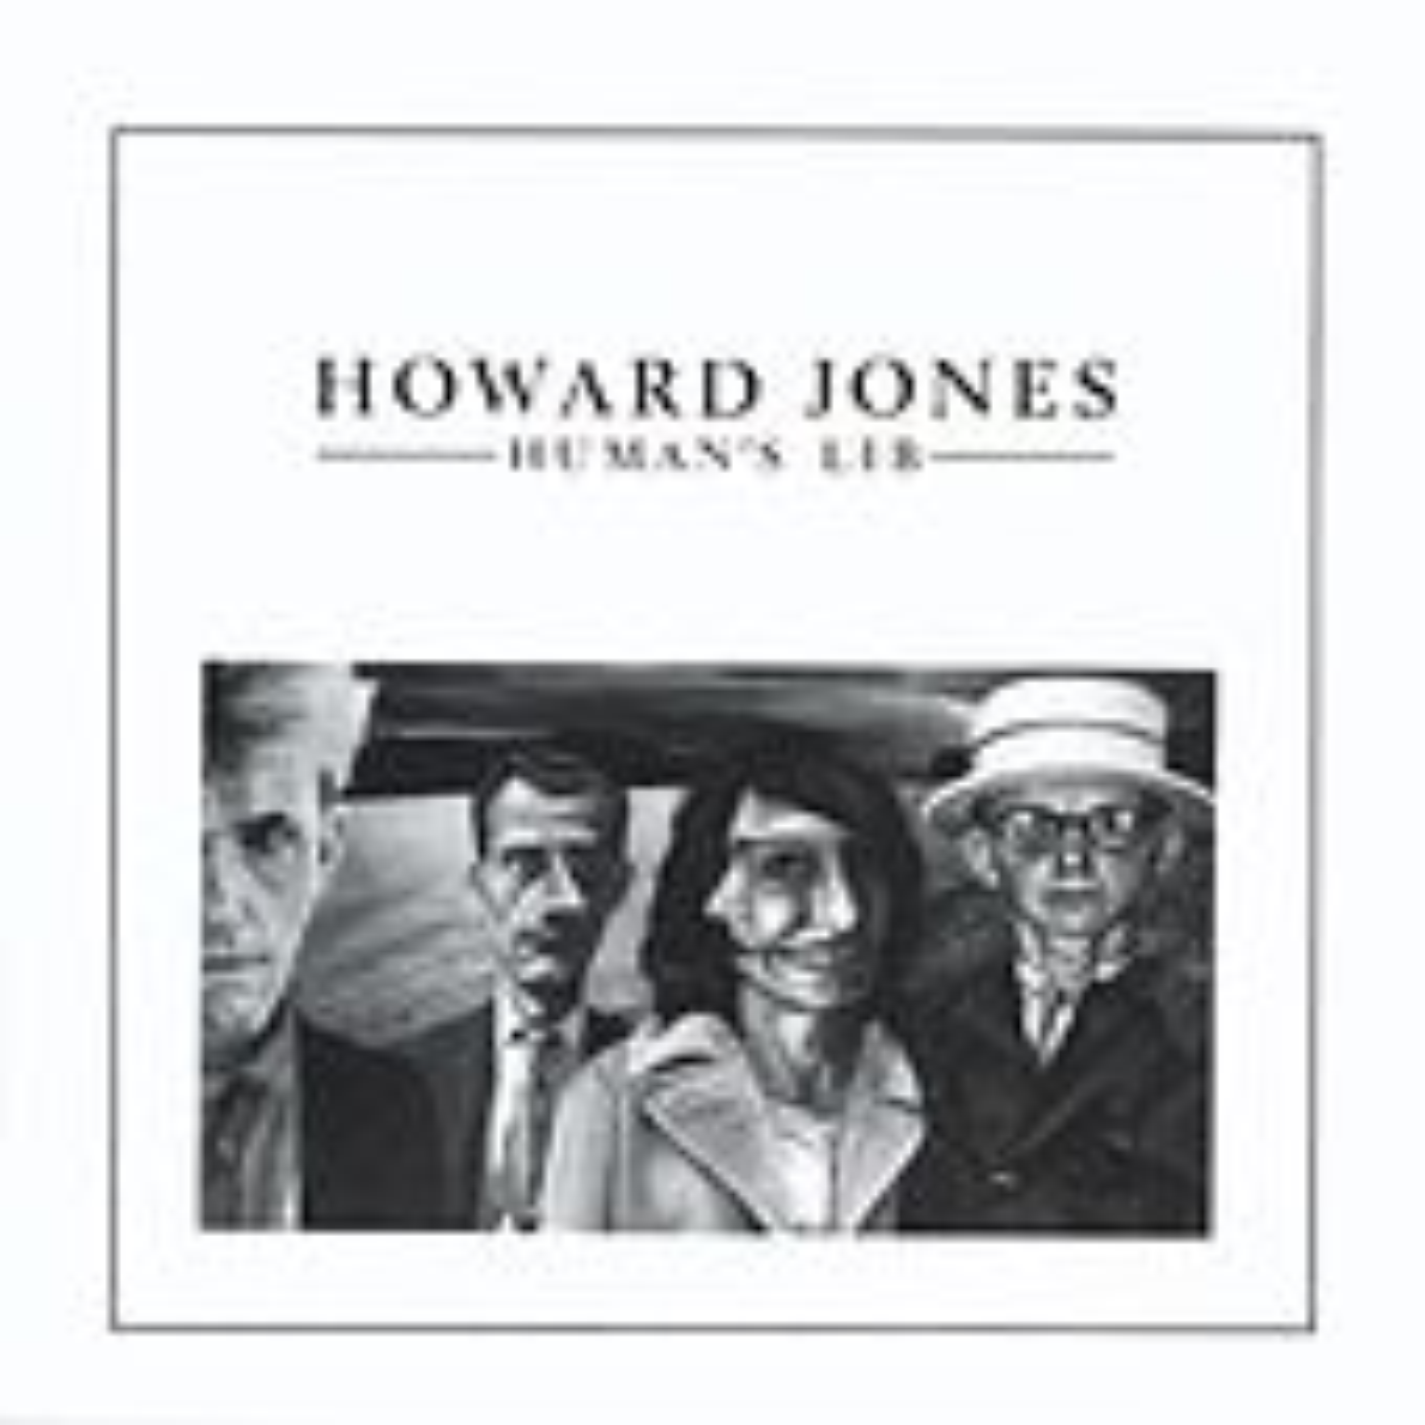 Human's Lib by Howard Jones